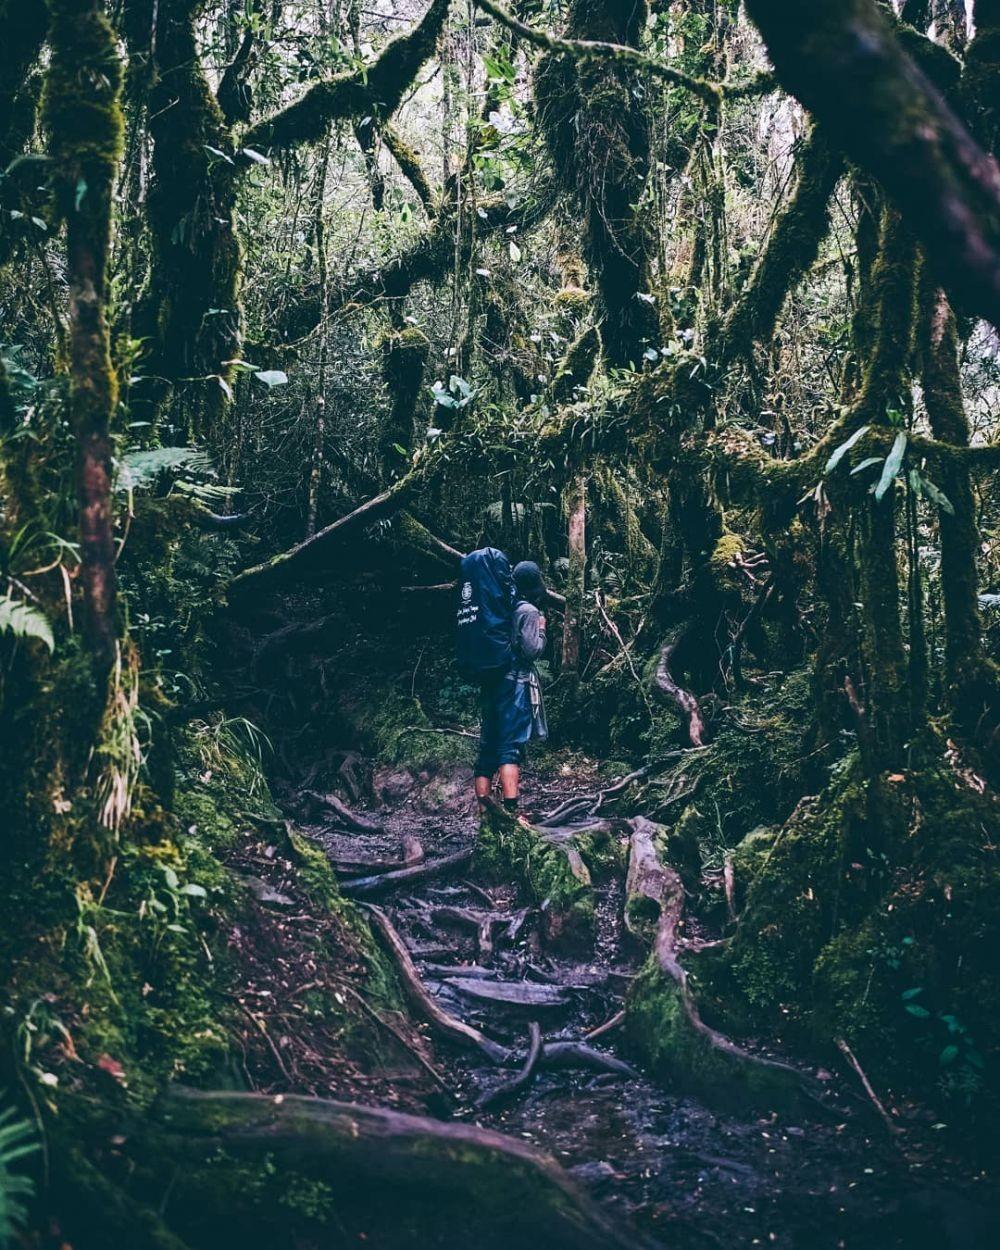 10 Tempat Wisata Paling Angker di Sumatra Barat, Bikin Merinding!